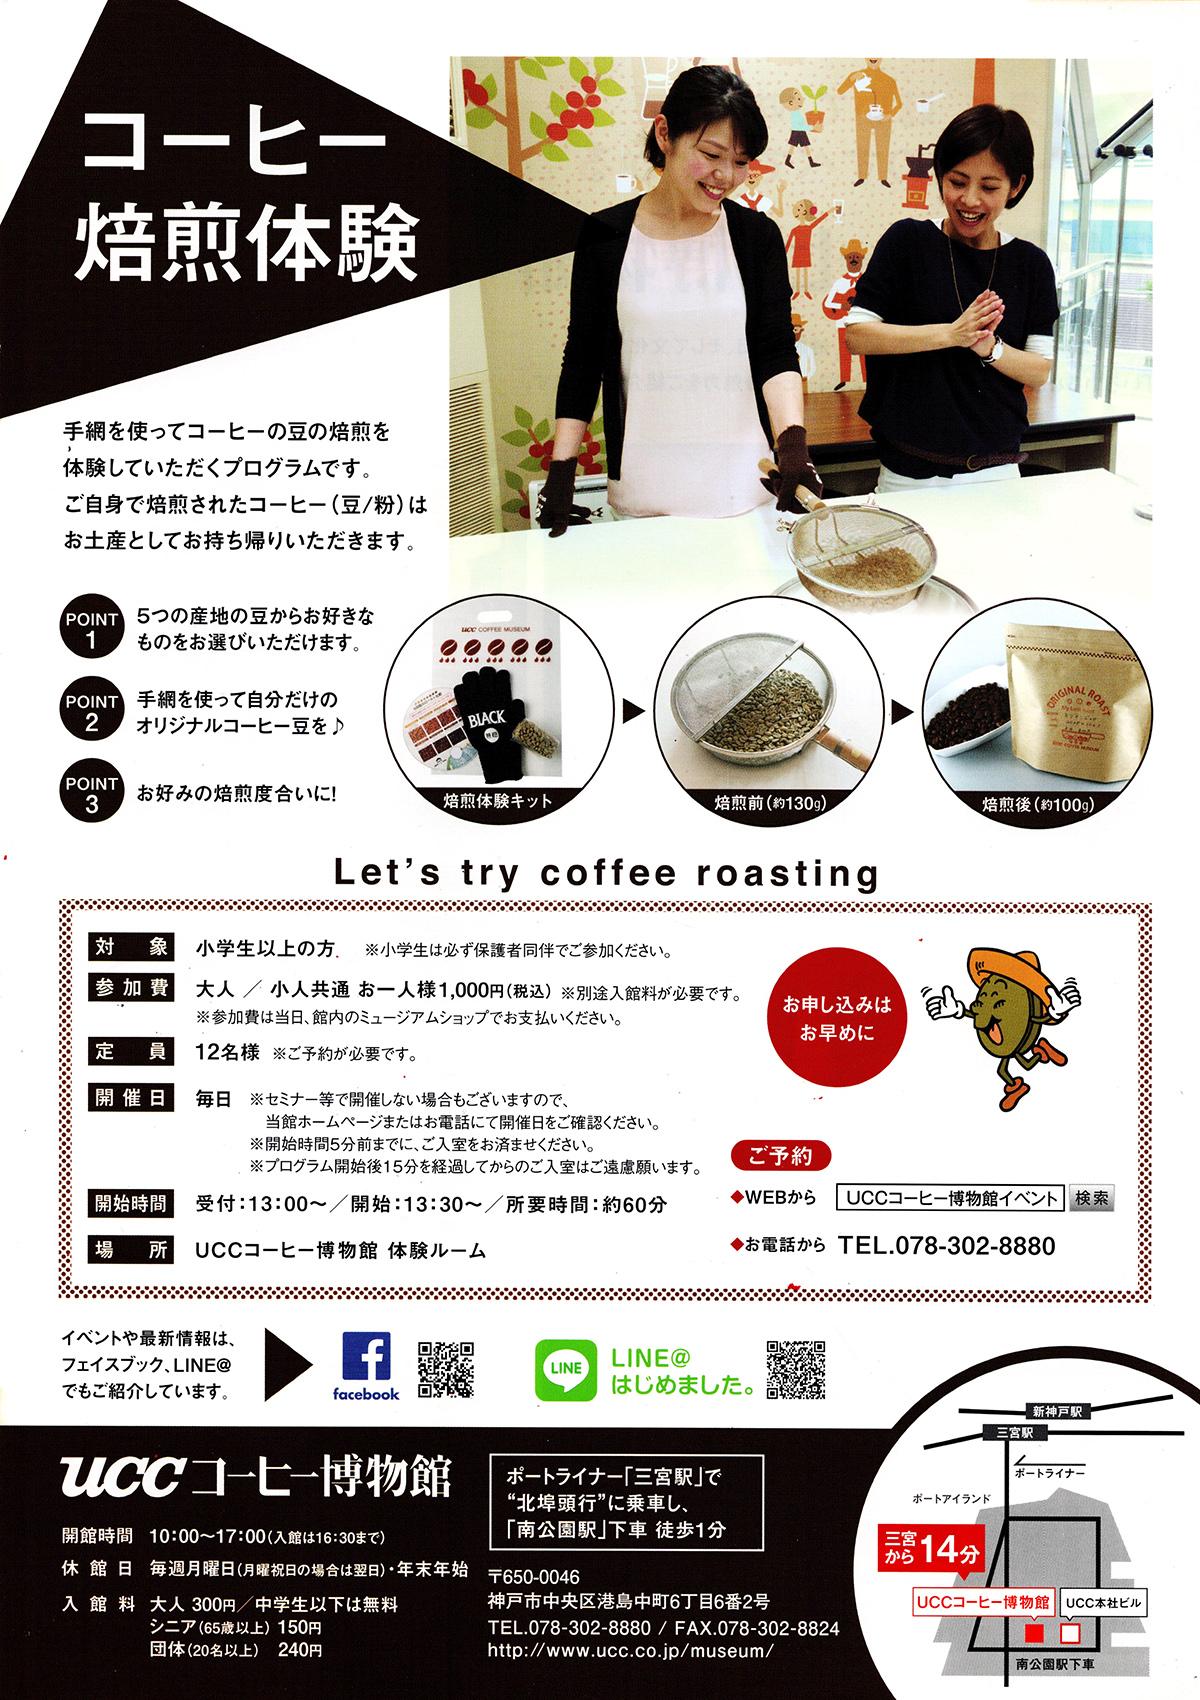 190827_ucc_coffee_02.jpg